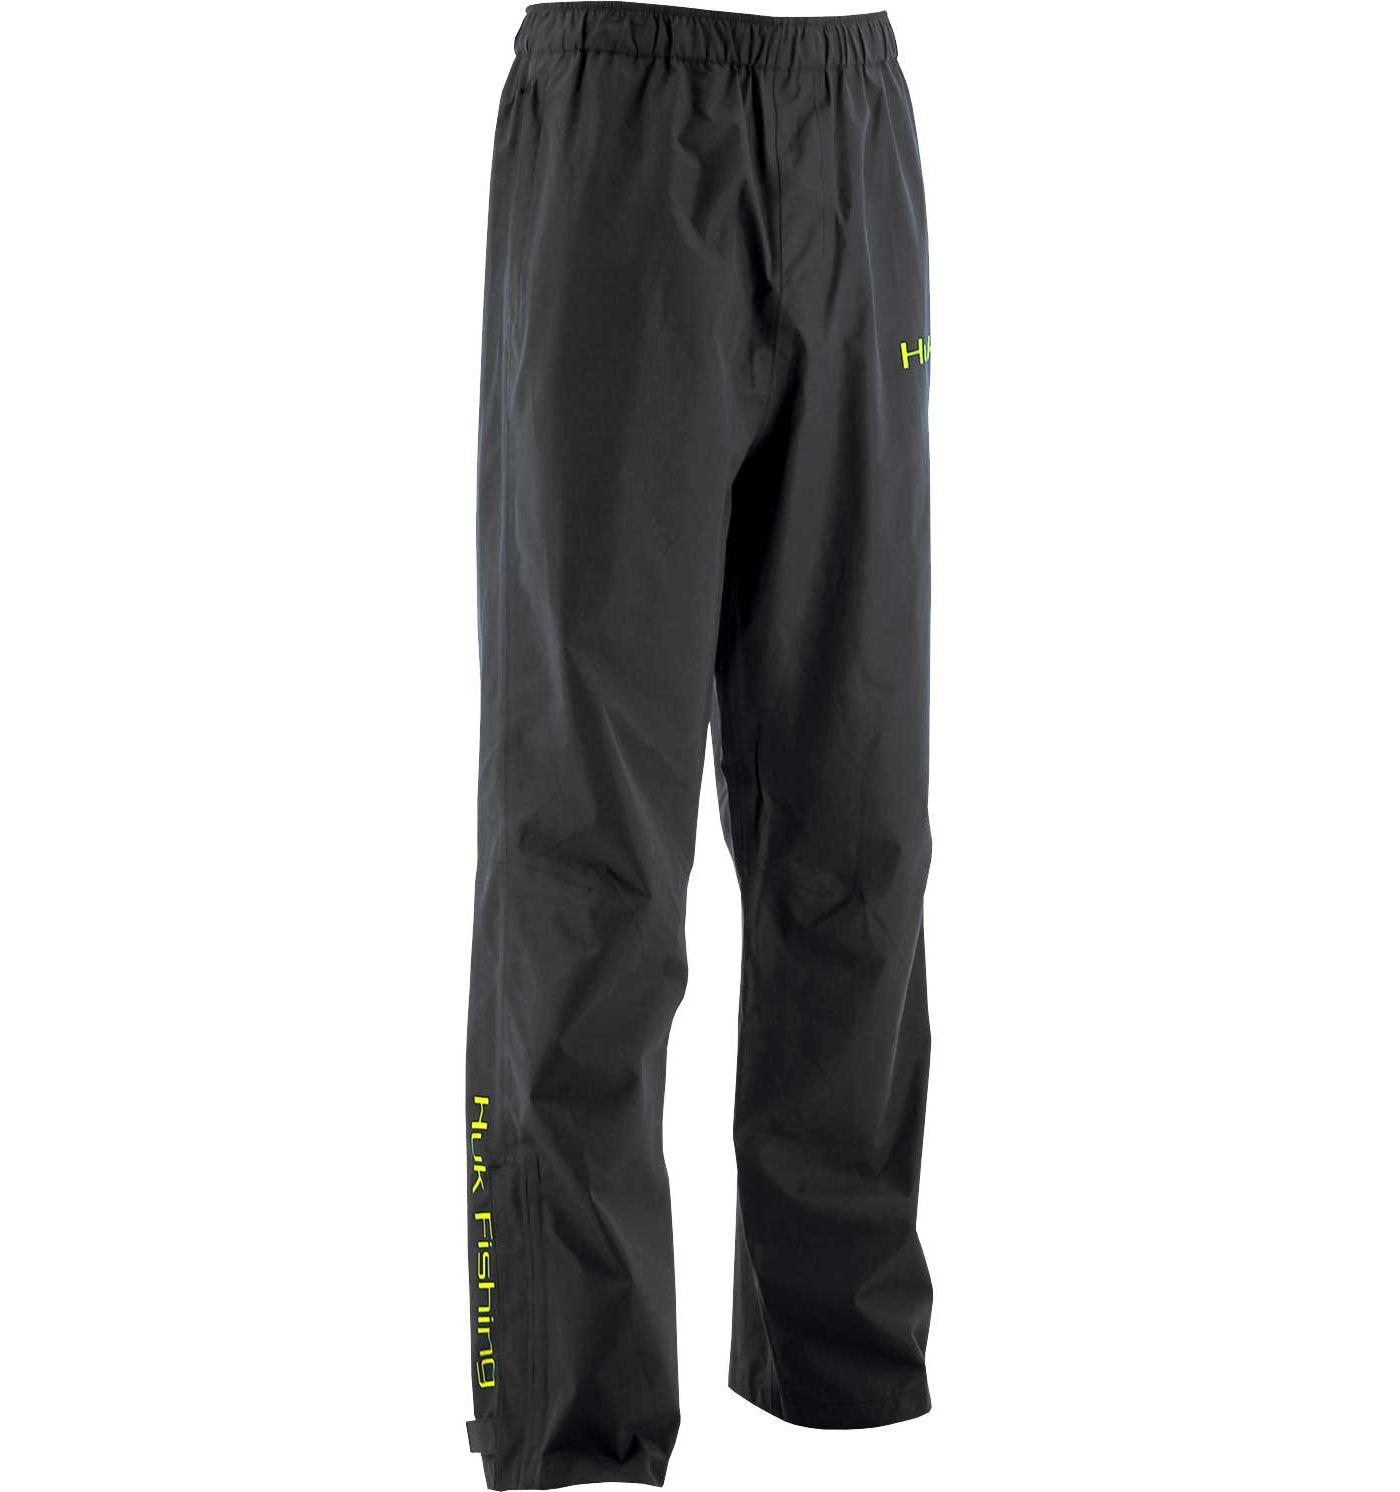 Huk Men's Packable Rain Pants